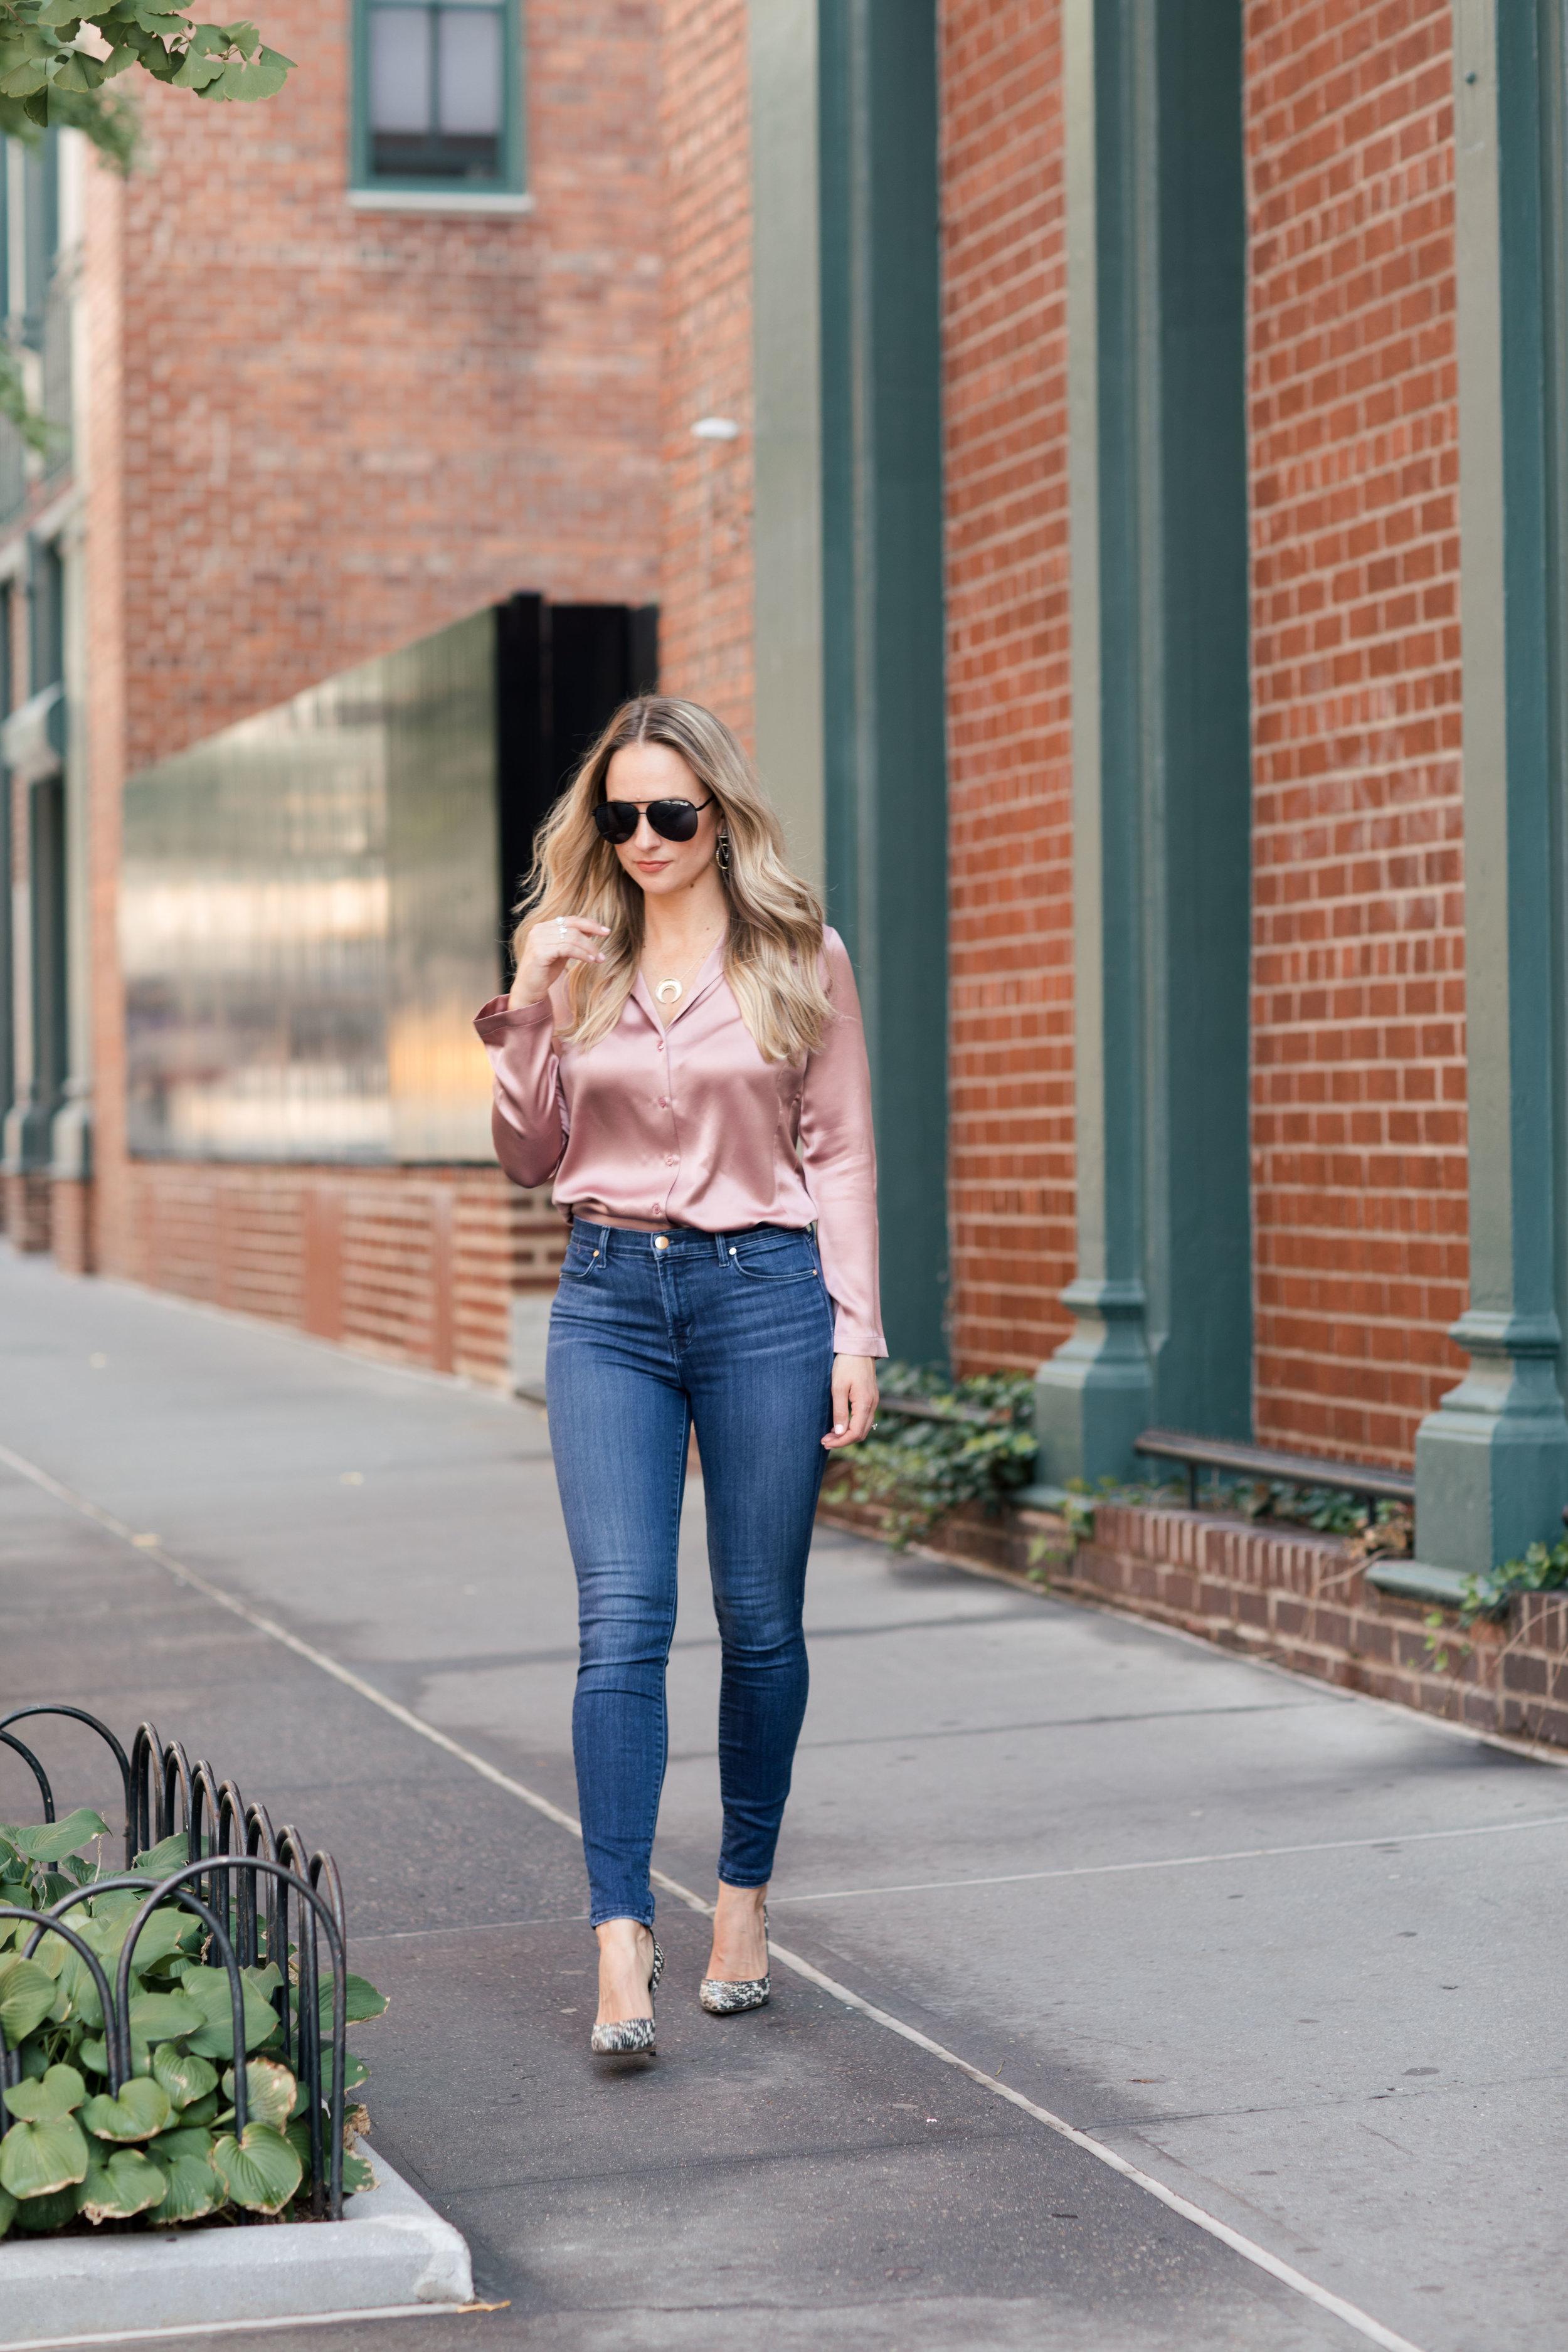 PJ blouse